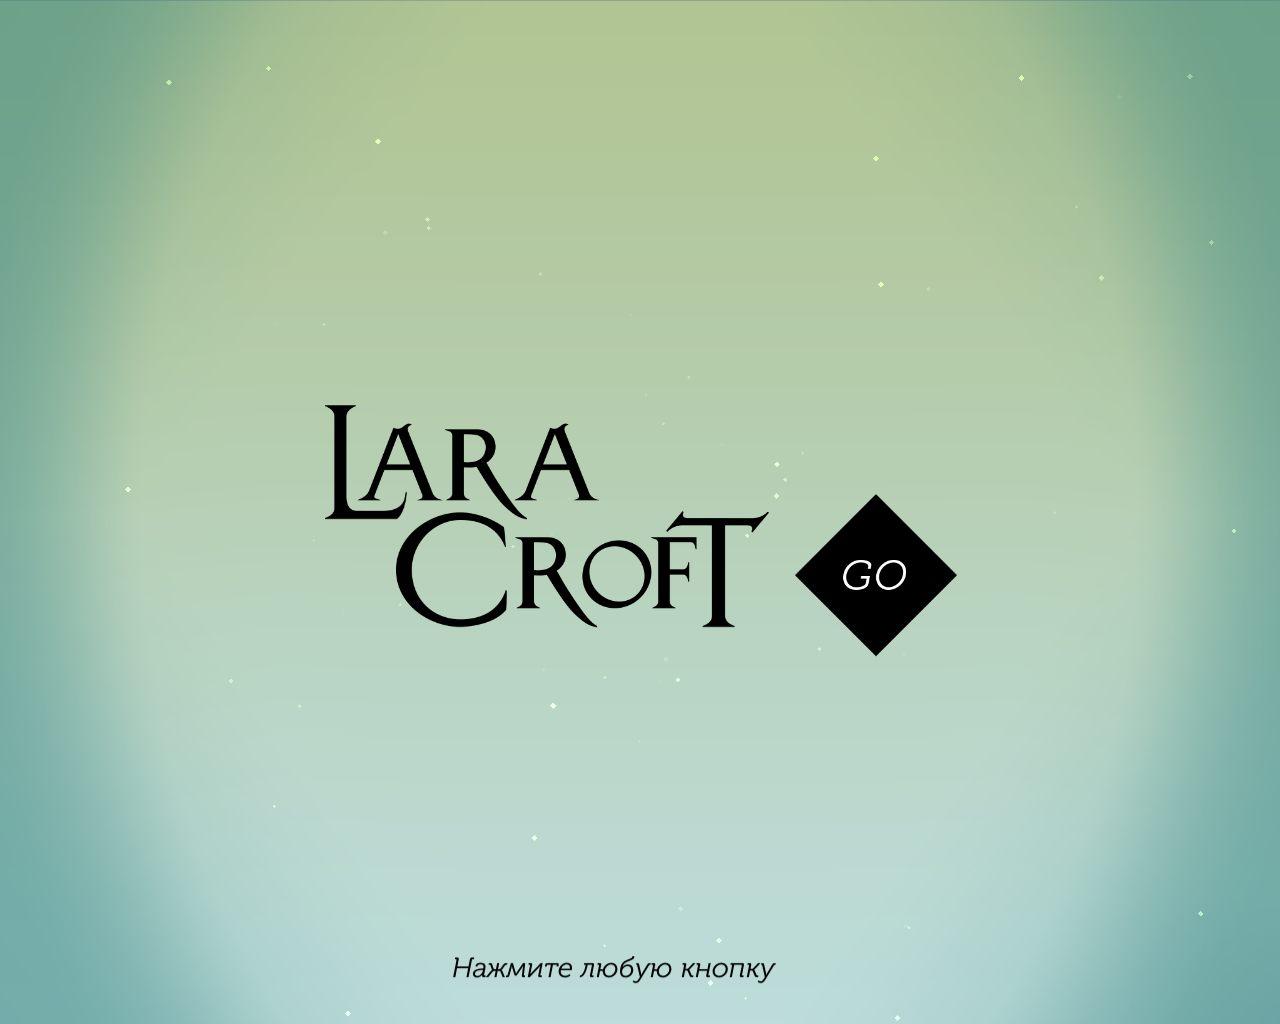 Lara croft hentaiwolrd nudes images